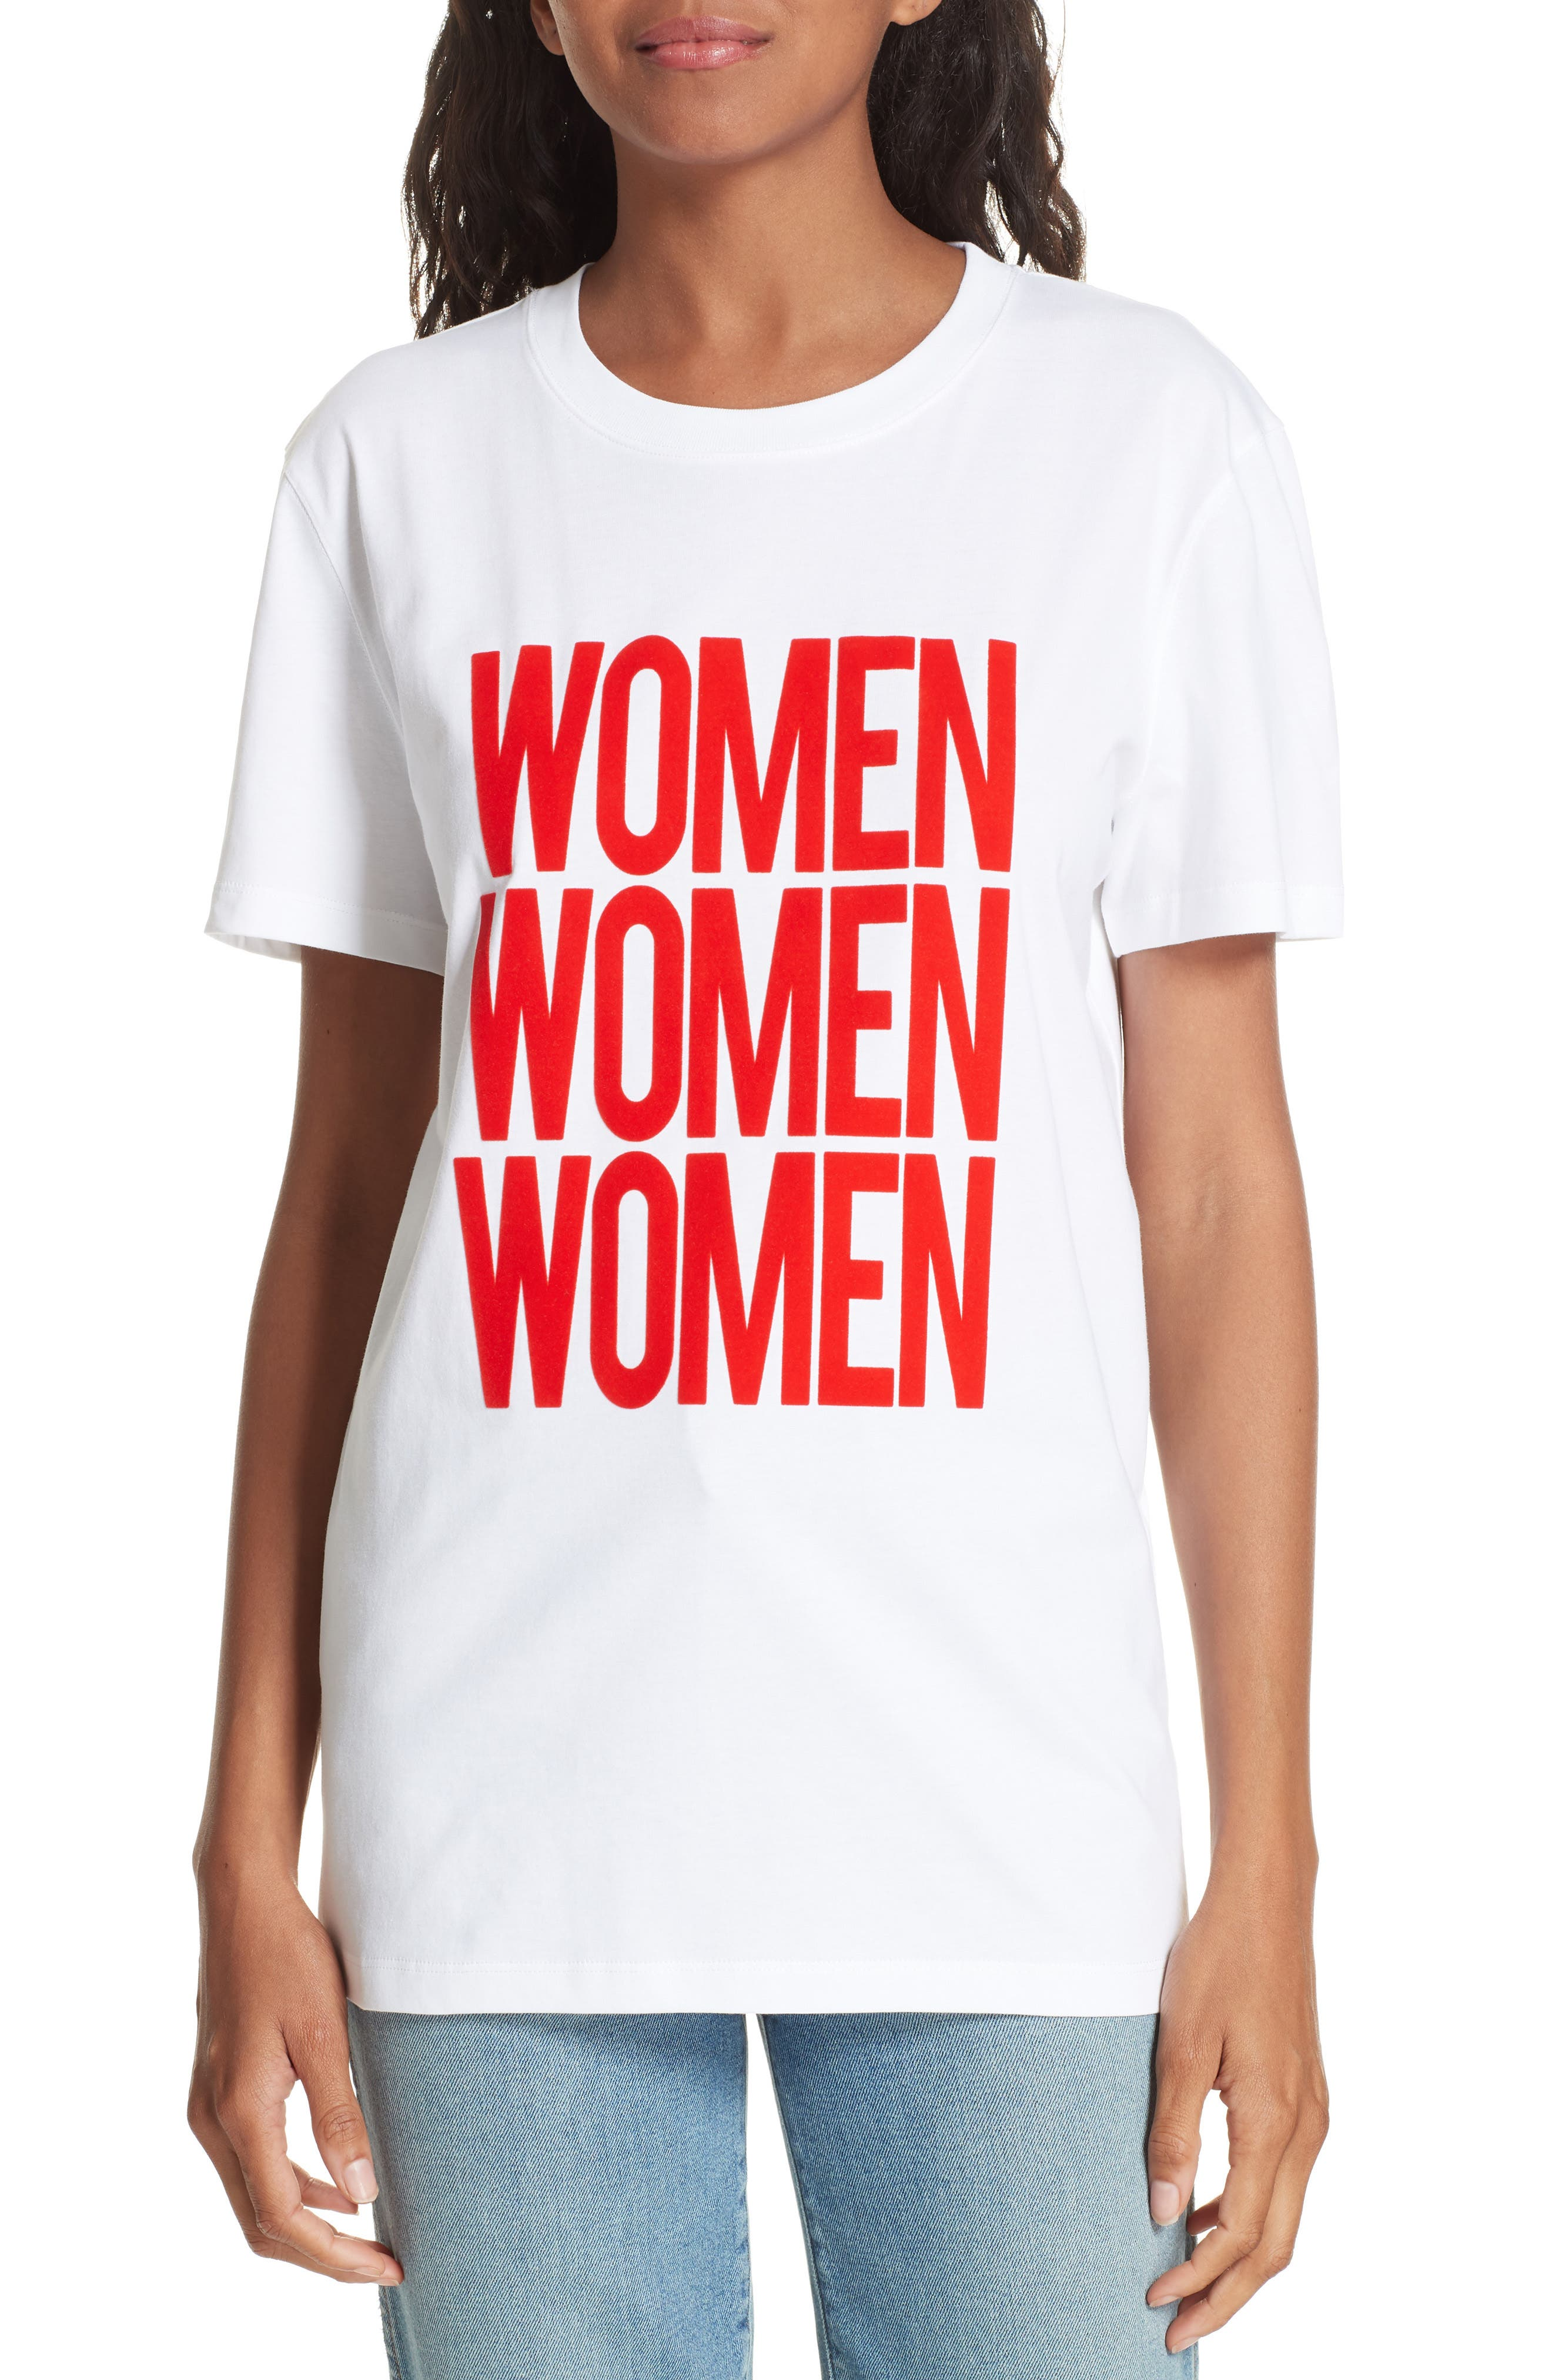 Ciel Women Women Women Tee,                             Main thumbnail 1, color,                             WHITE